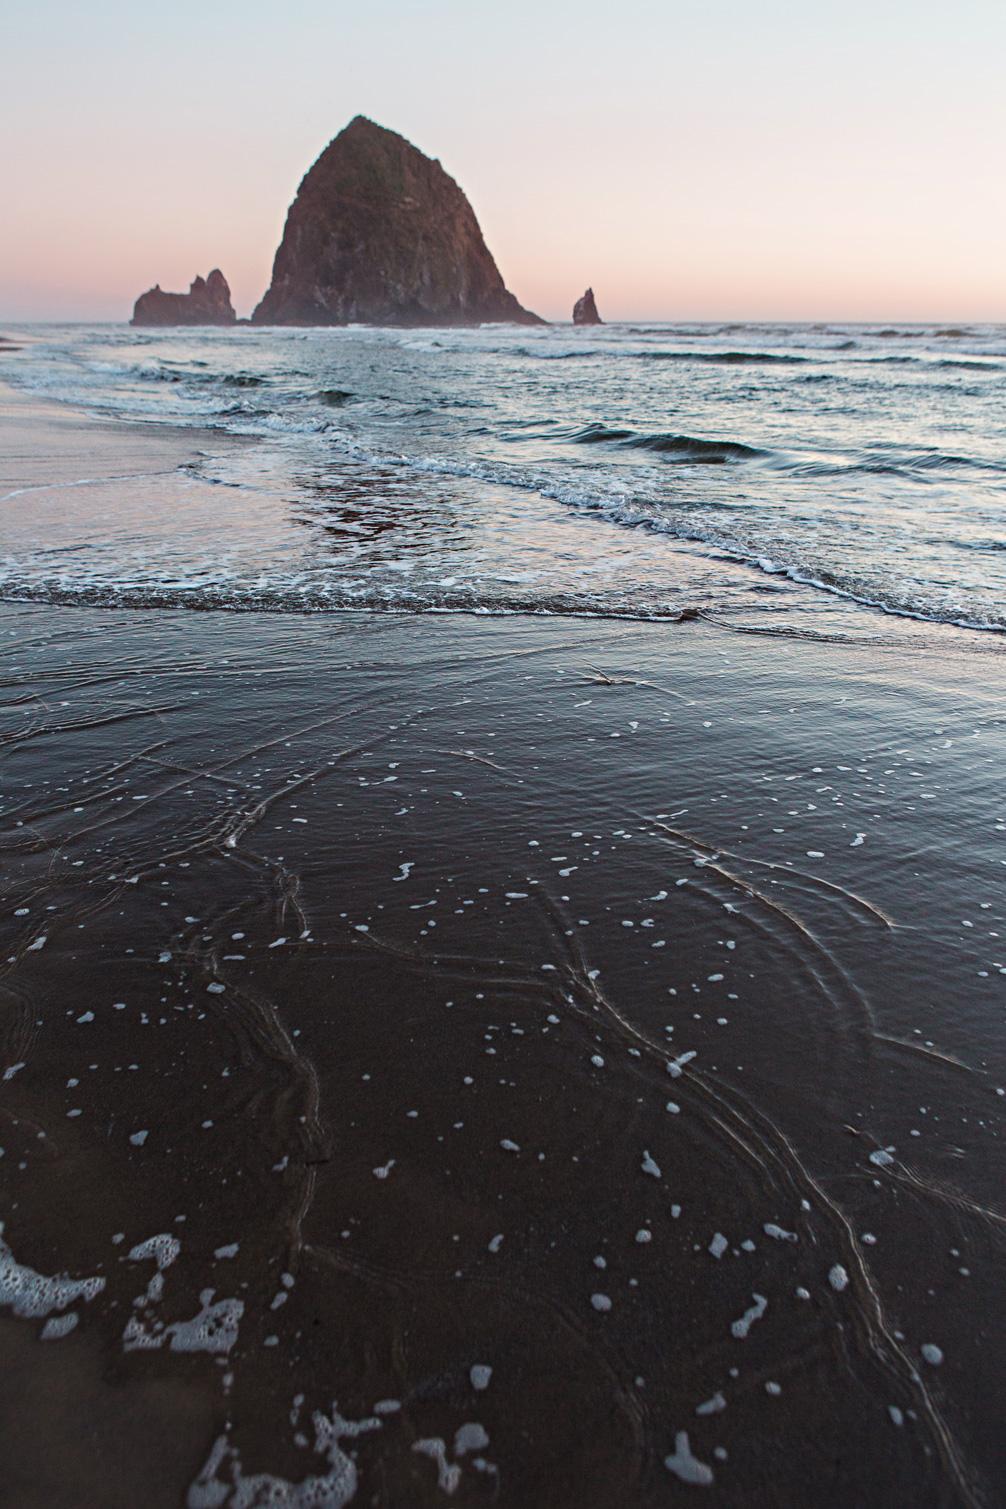 CindyGiovagnoli_Crater_Lake_National_Park_Cape_Perpetua_Heceta_Head_lighthouse_Pacific_Ocean_Cannon_Beach_haystack_Oregon_coast-013.jpg